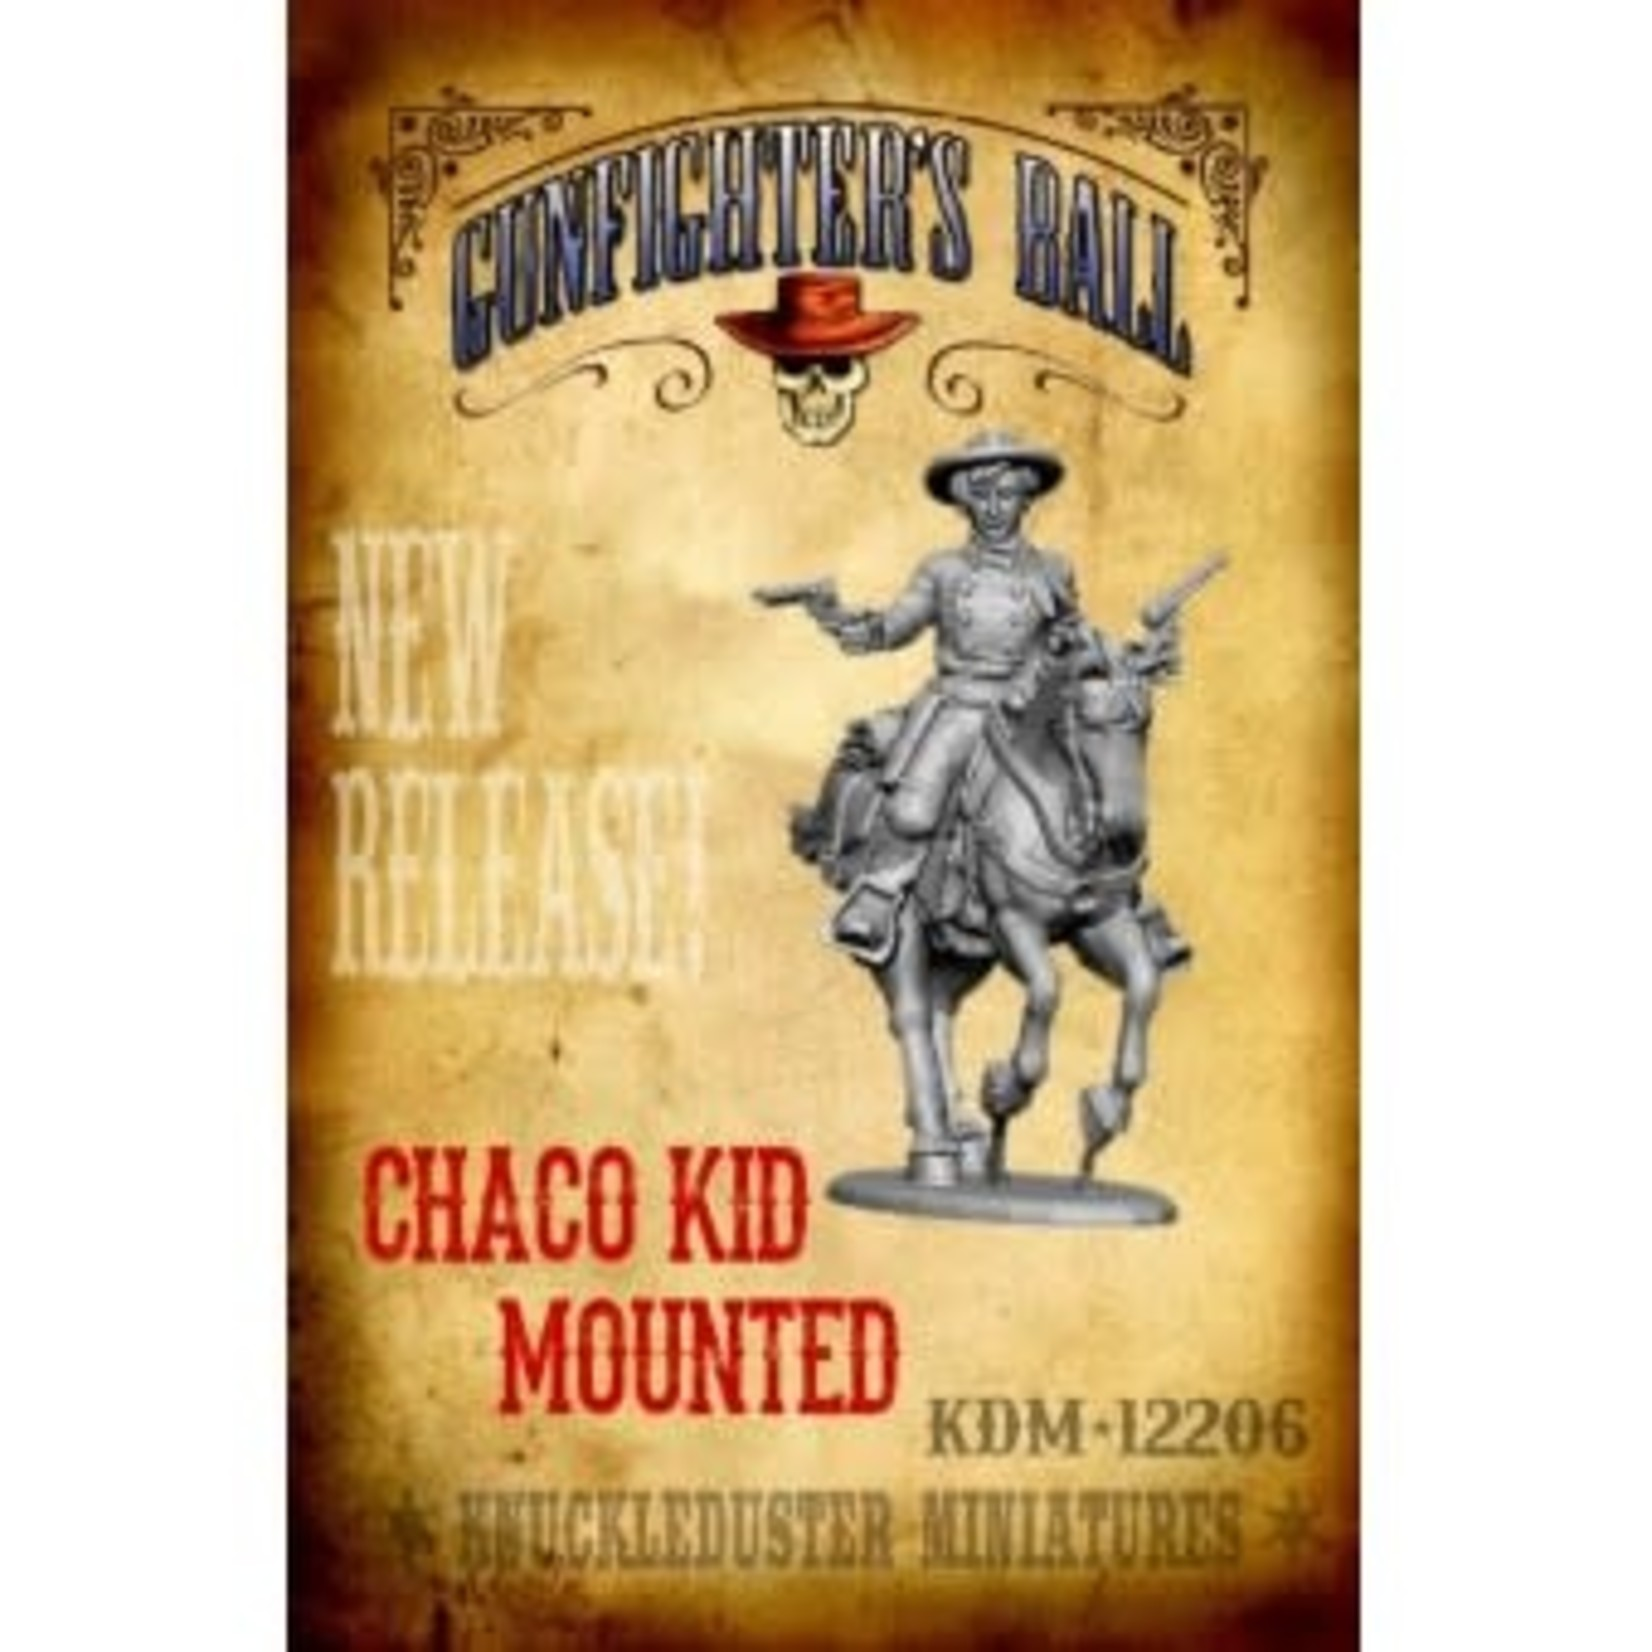 Chaco Kid Mounted